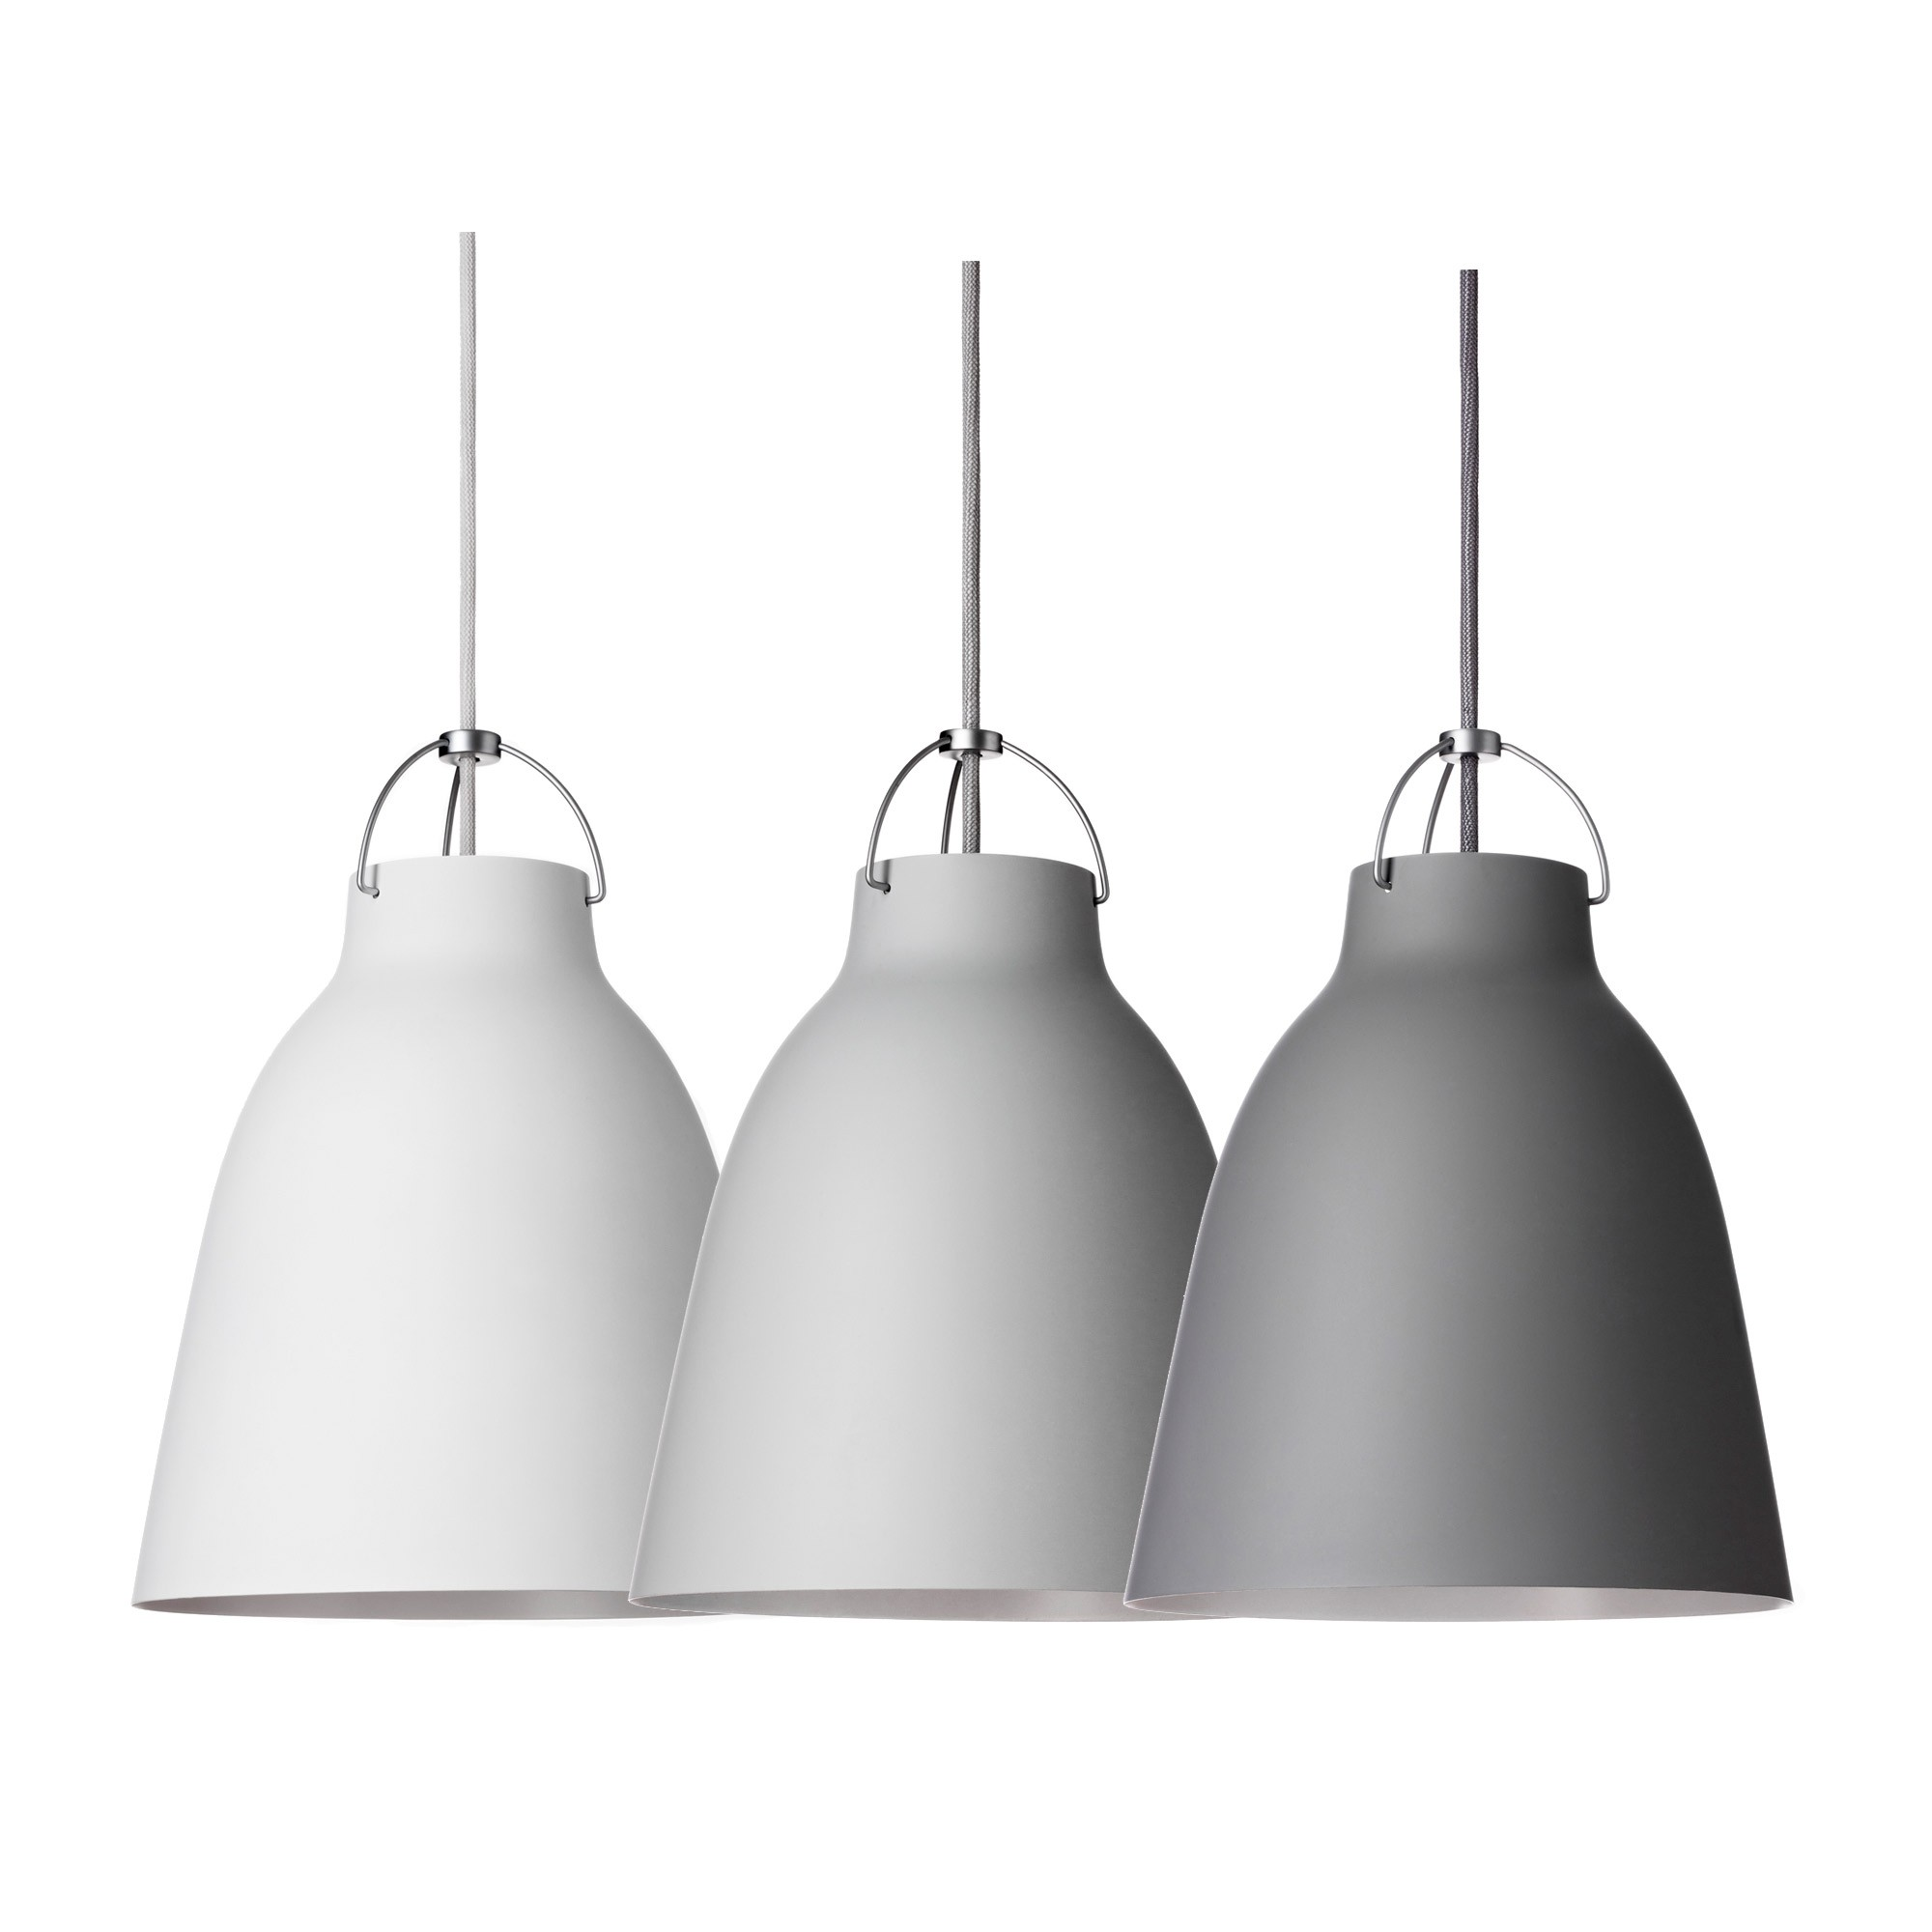 New Lighting Ranges Added To Papillon Papillon Interiors